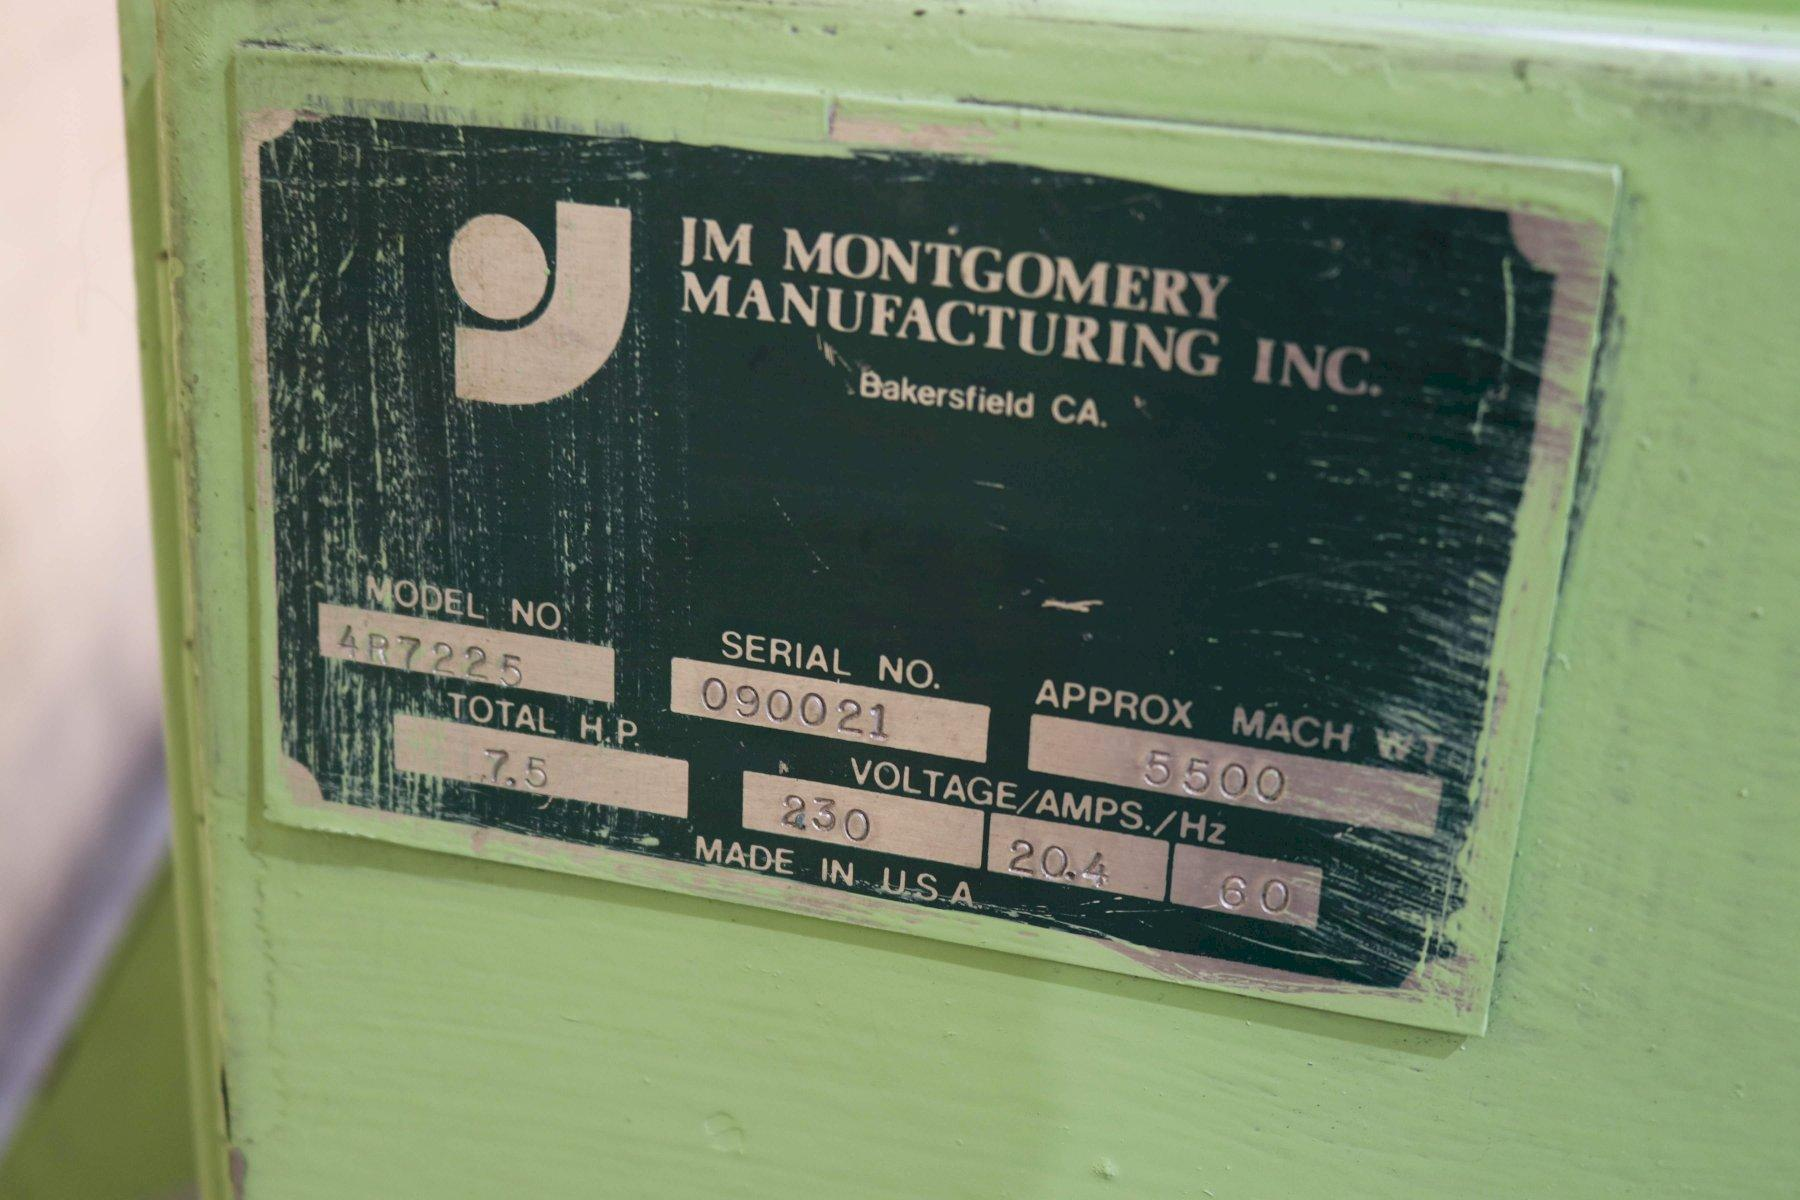 6' X 1/4' MONTGOMERY MODEL #4R-7225H PLATE BENDING ROLLS; STOCK #73476